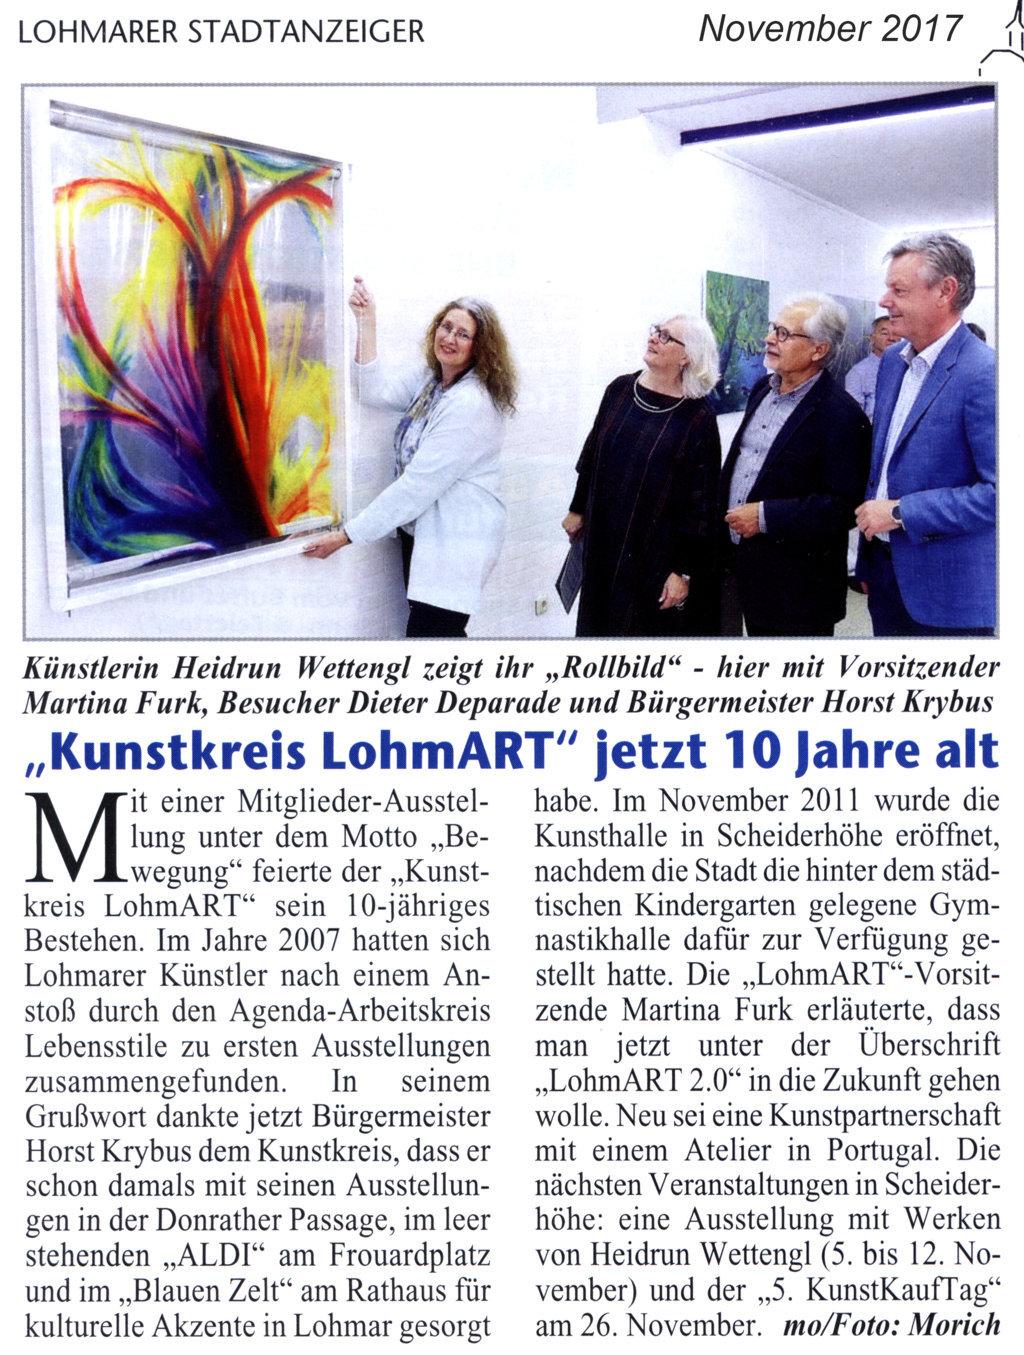 2017-11_Lohmarer-Stadtanzeiger_LohmART-2-0